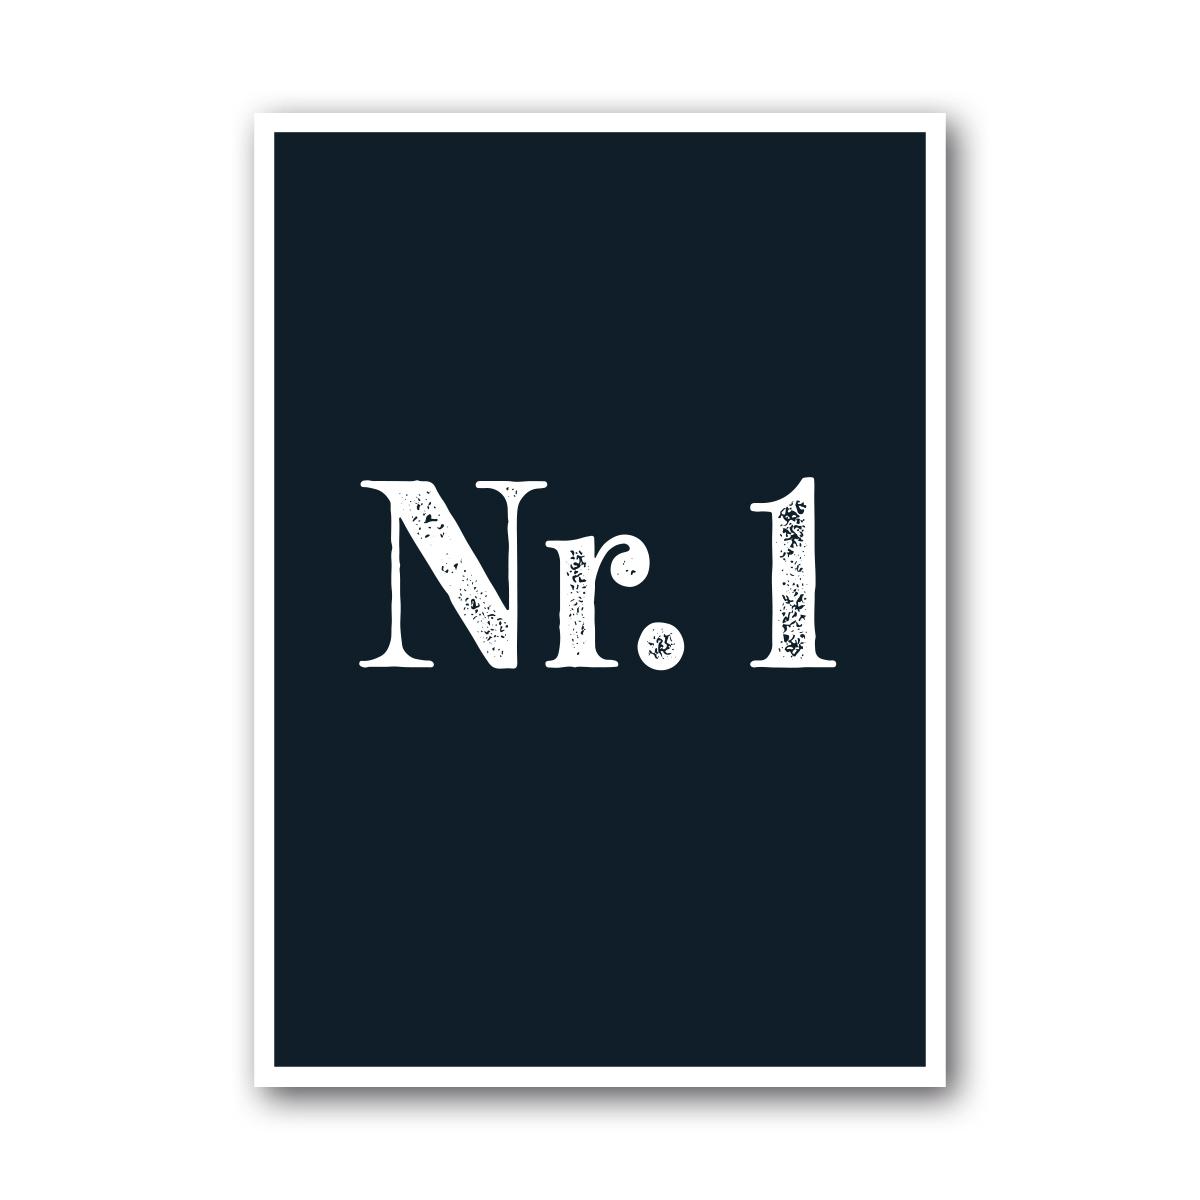 NUKAART_SHOP_11